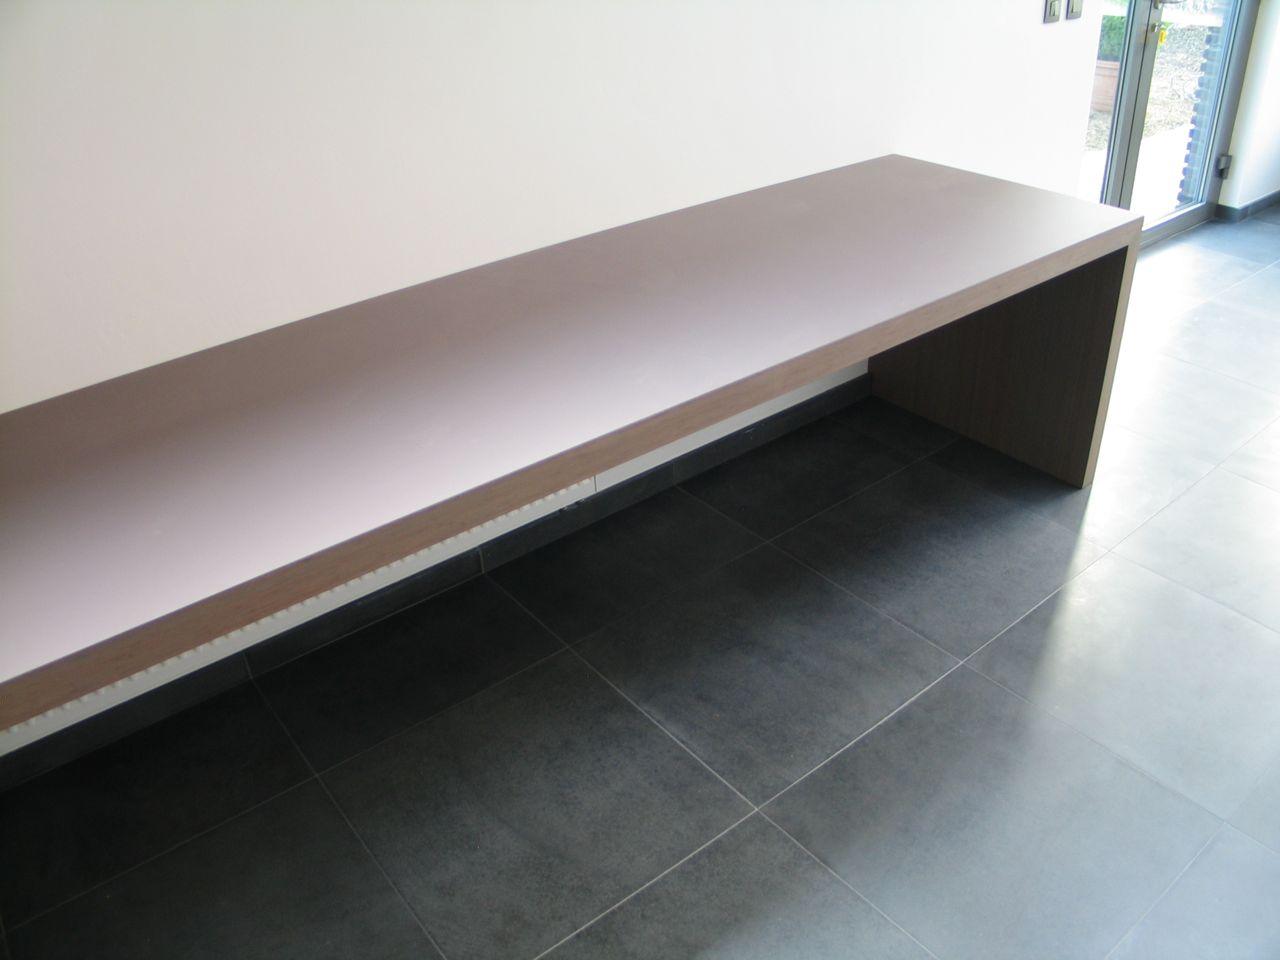 Desks frits kuitenbrouwer tailor made furniture - S van de bureau ...